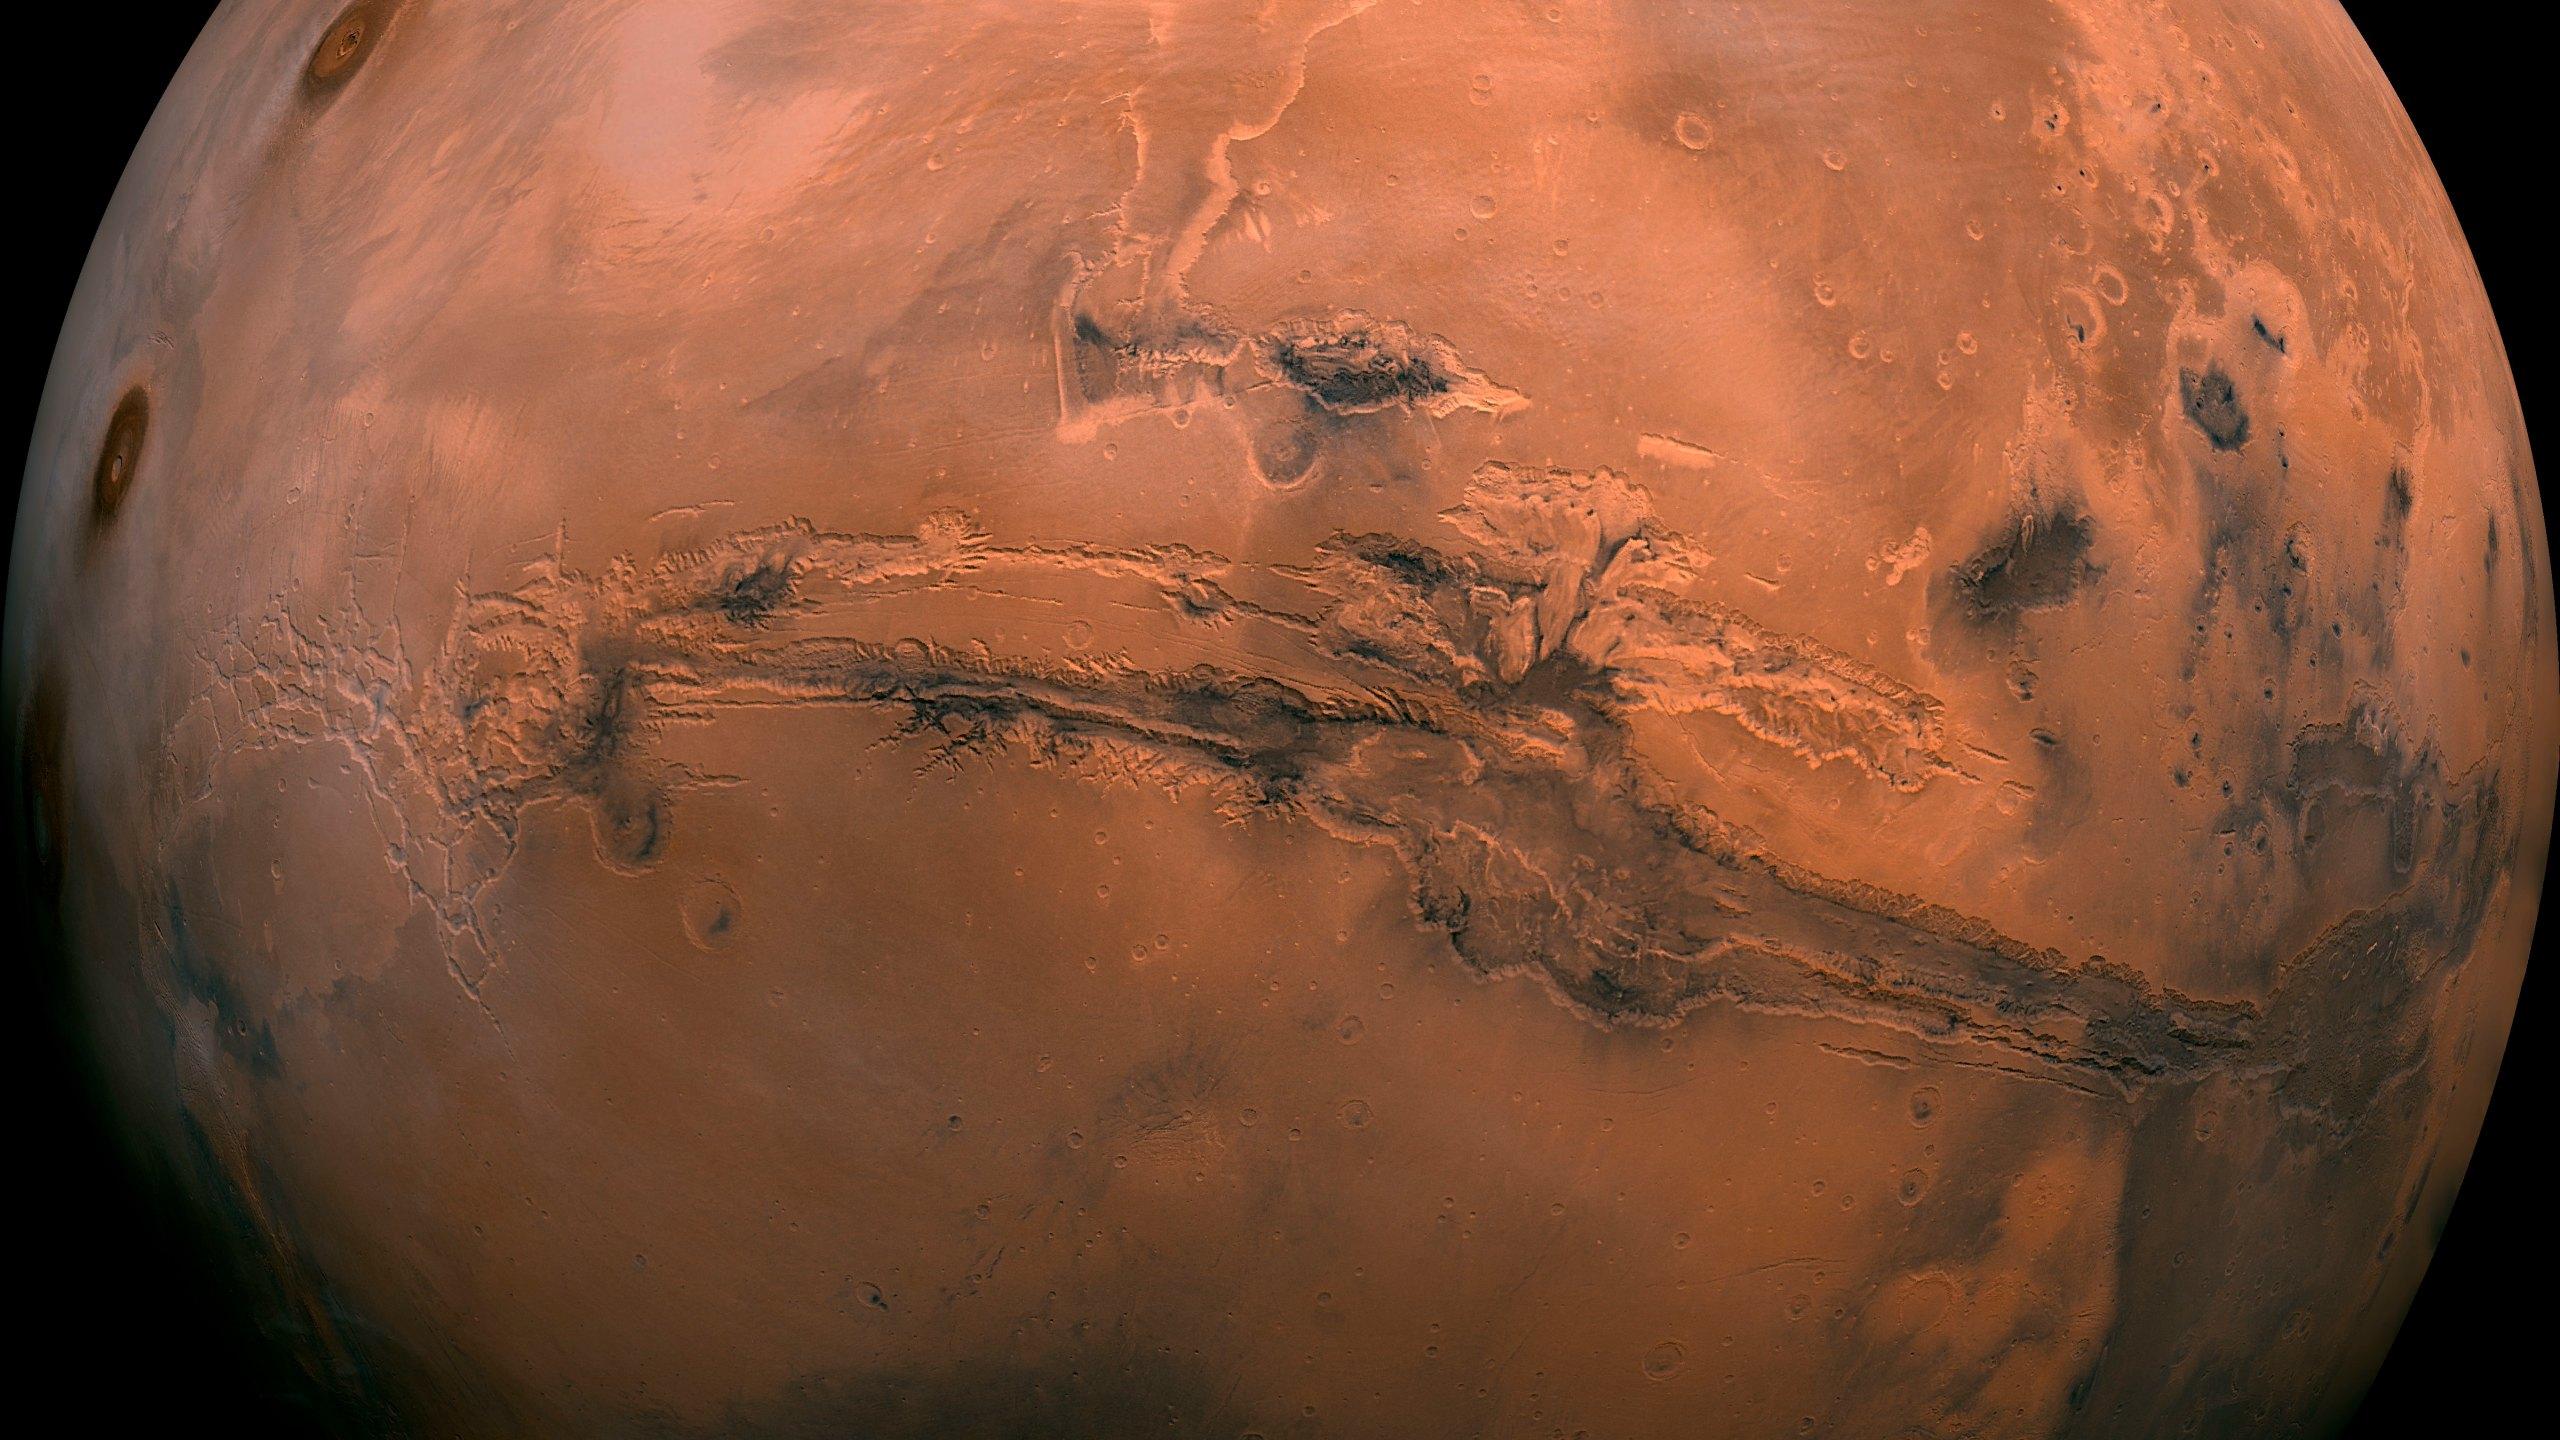 Space_Mars_Charm_86415-159532.jpg51772357